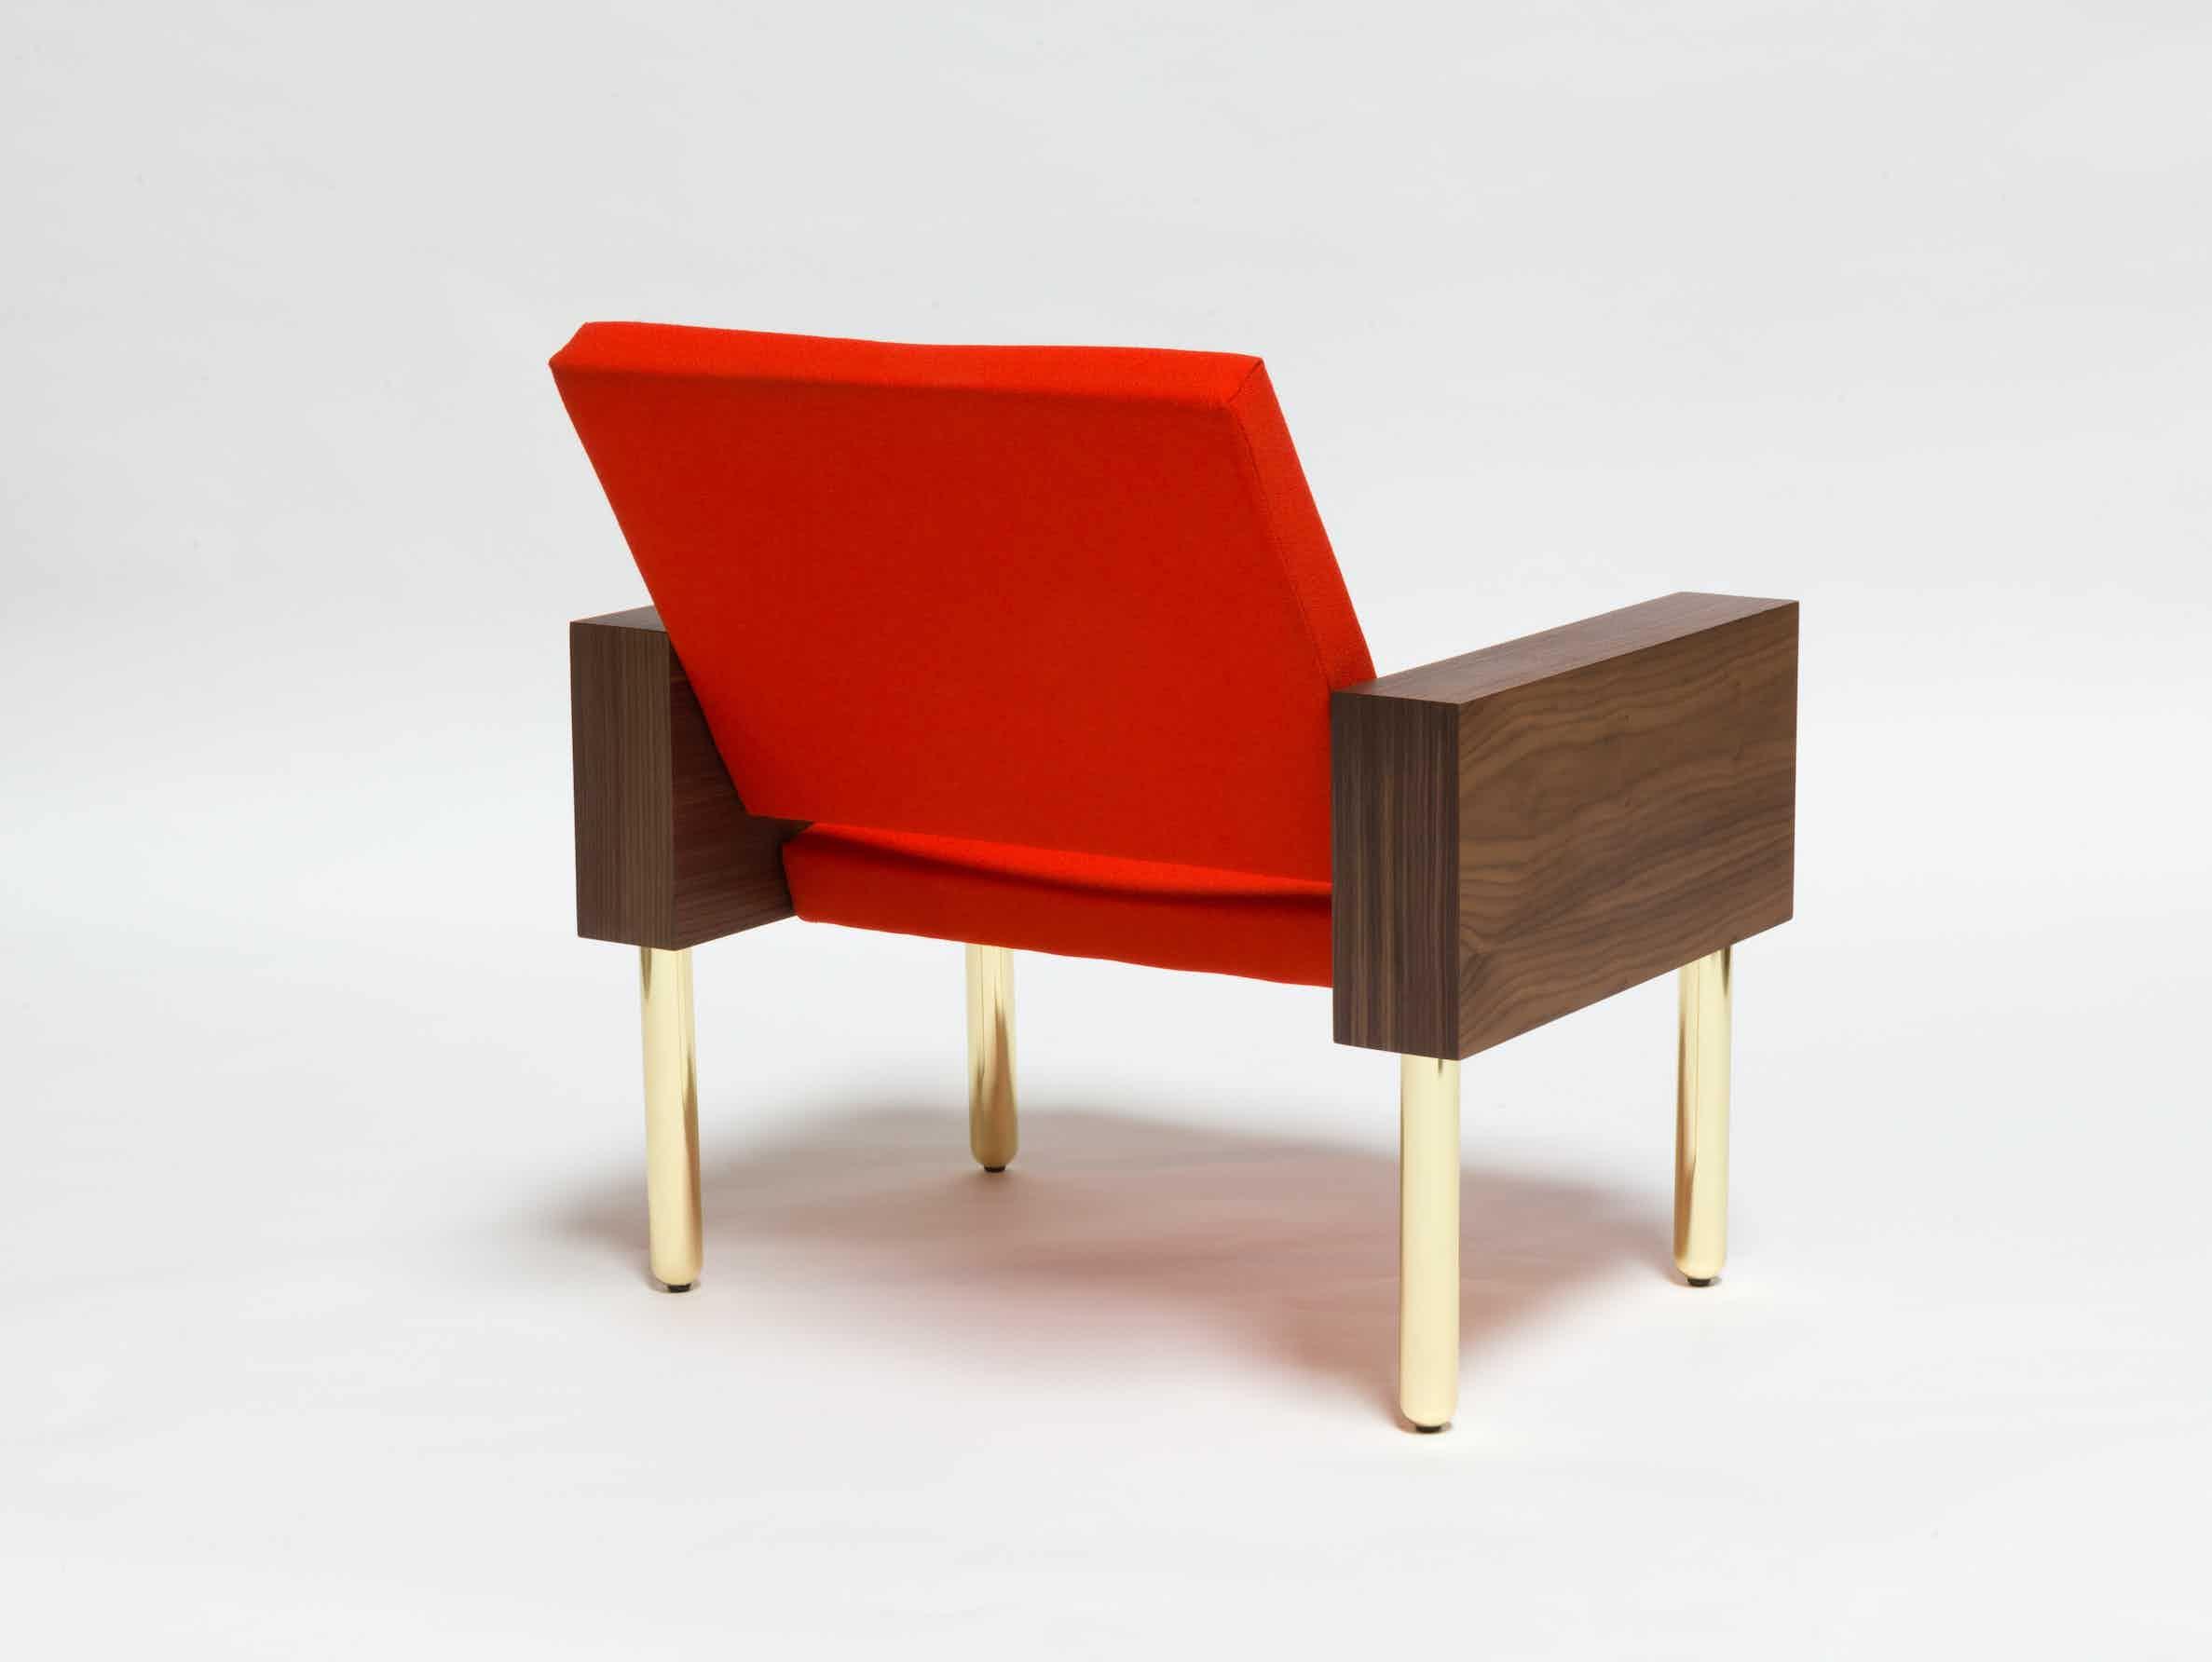 La-chance-furniture-block-armchair-red-angle-haute-living